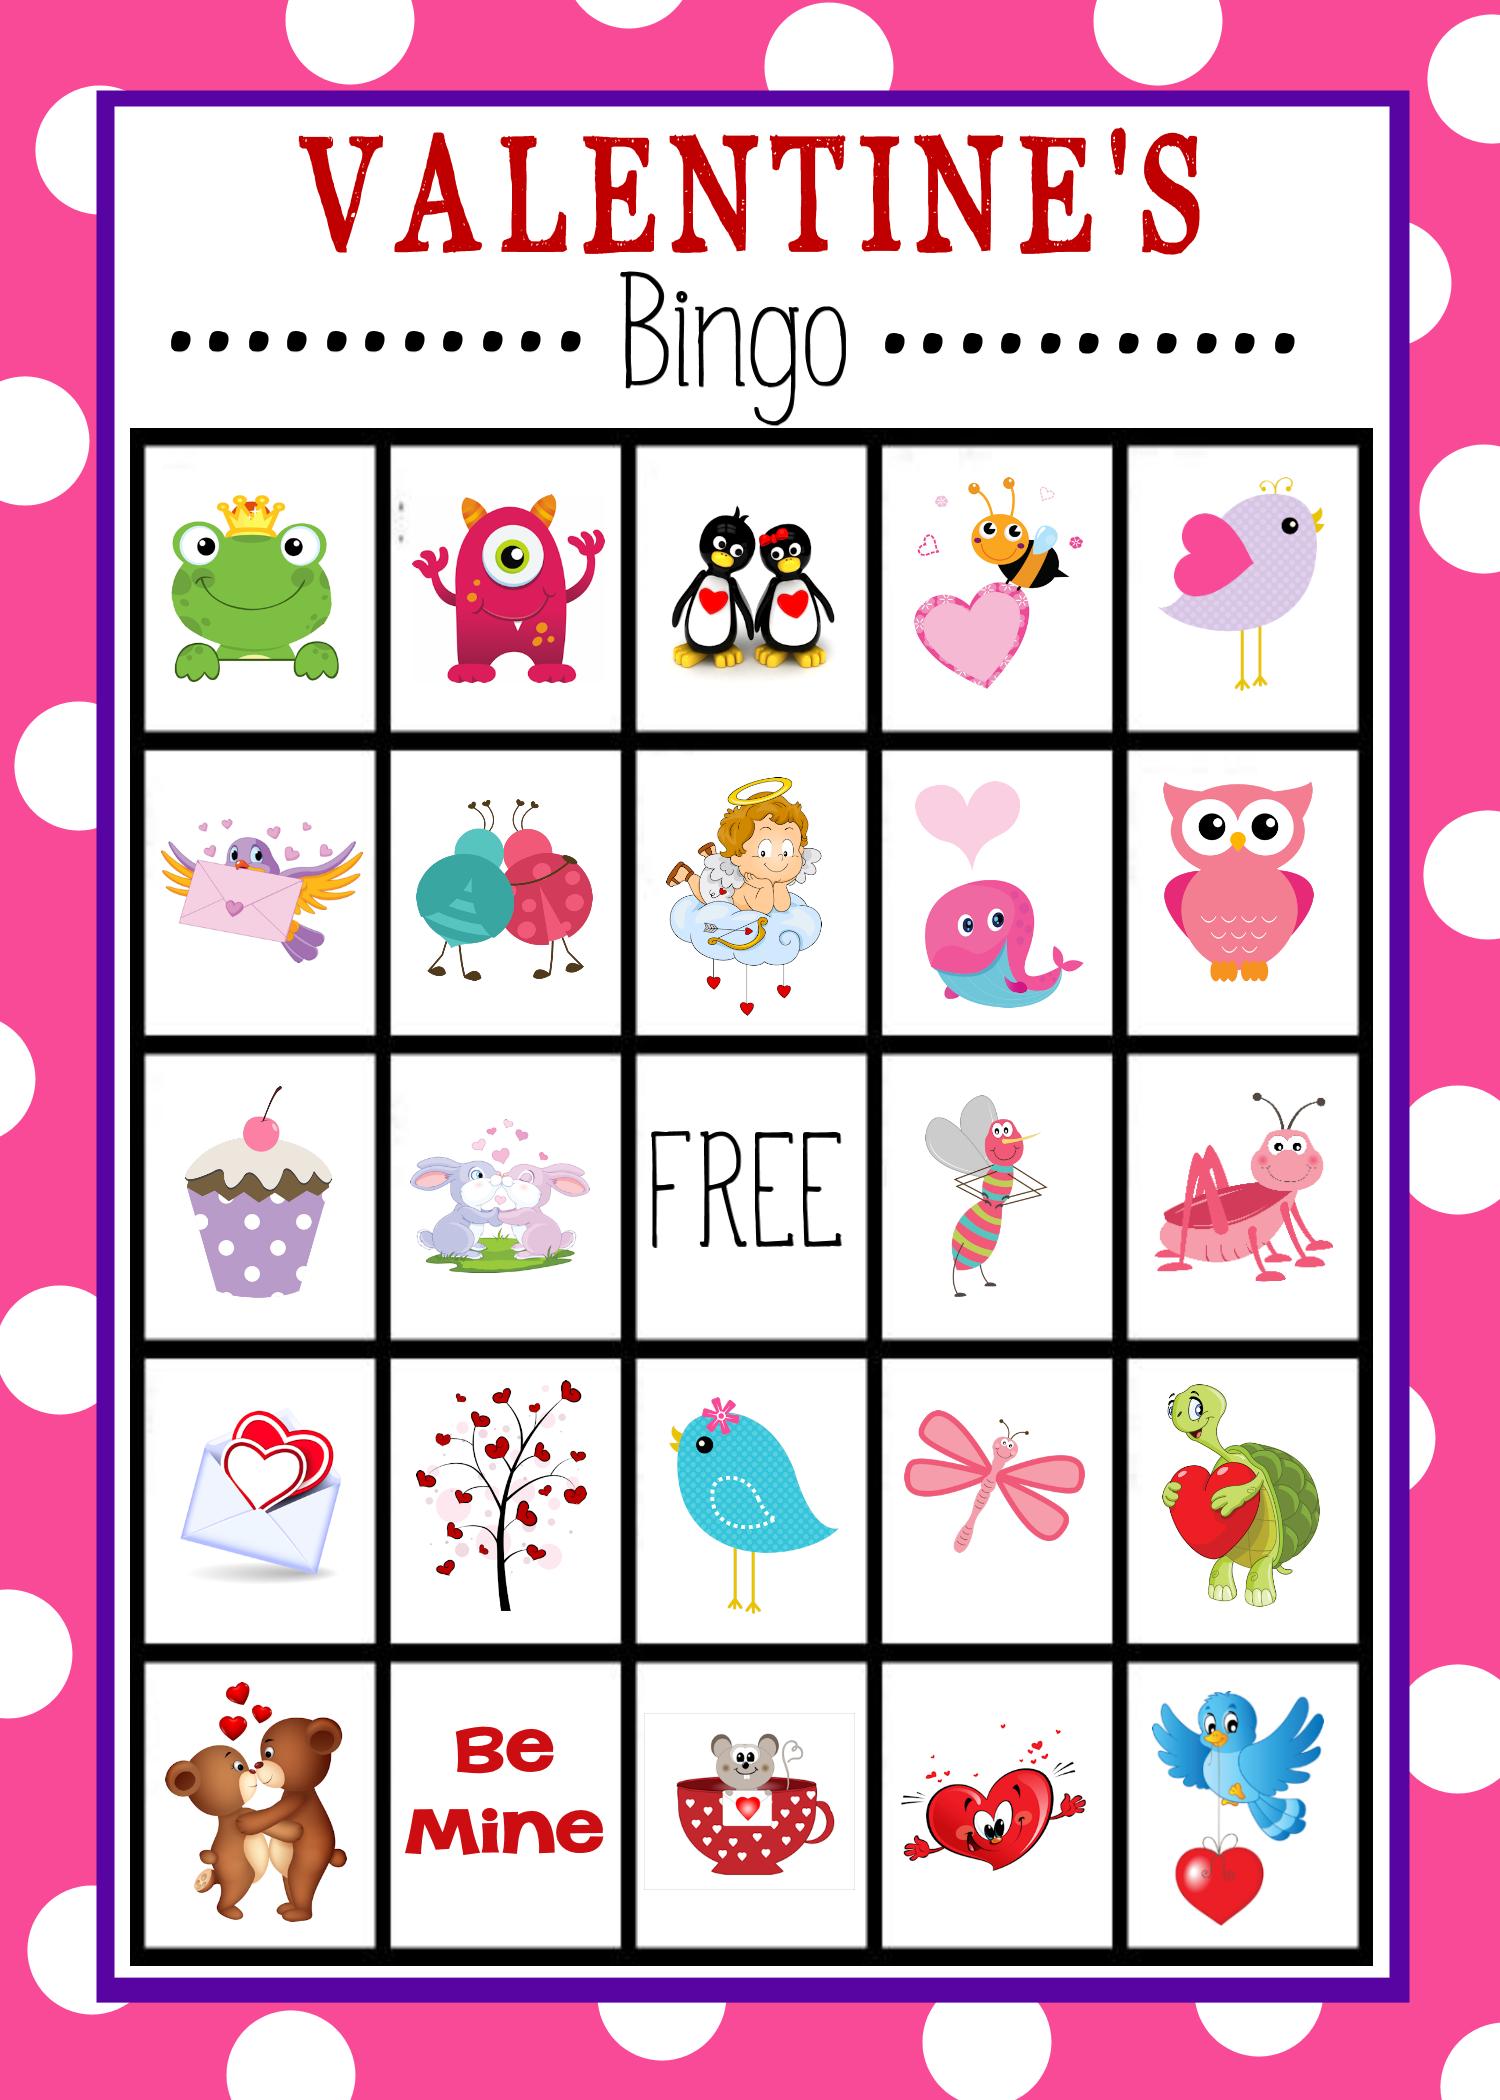 9 Images of Valentine's Day Bingo Game Printable